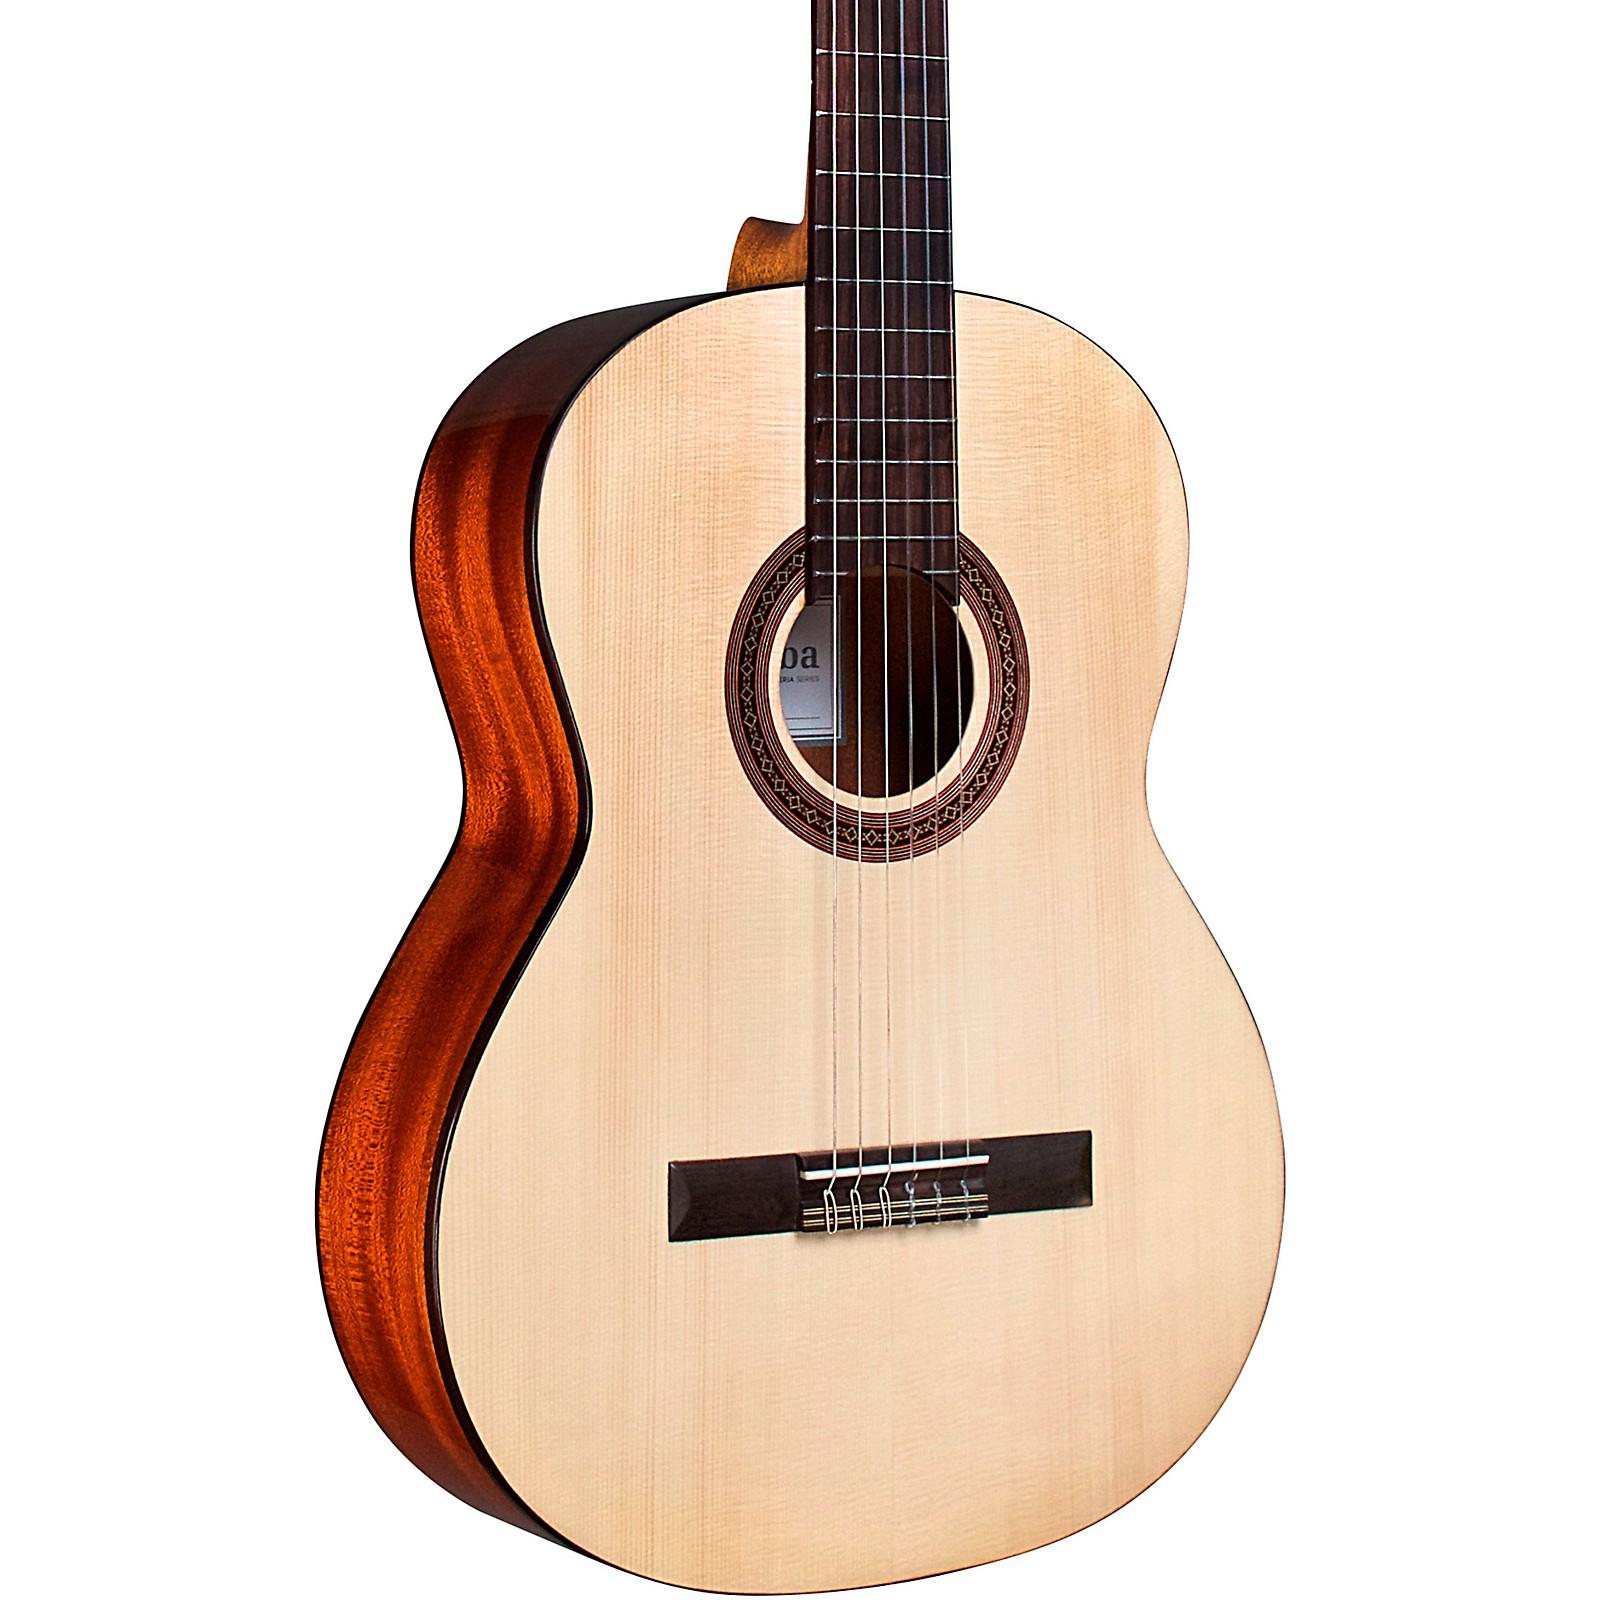 Cordoba C5 SP Classical Acoustic Guitar